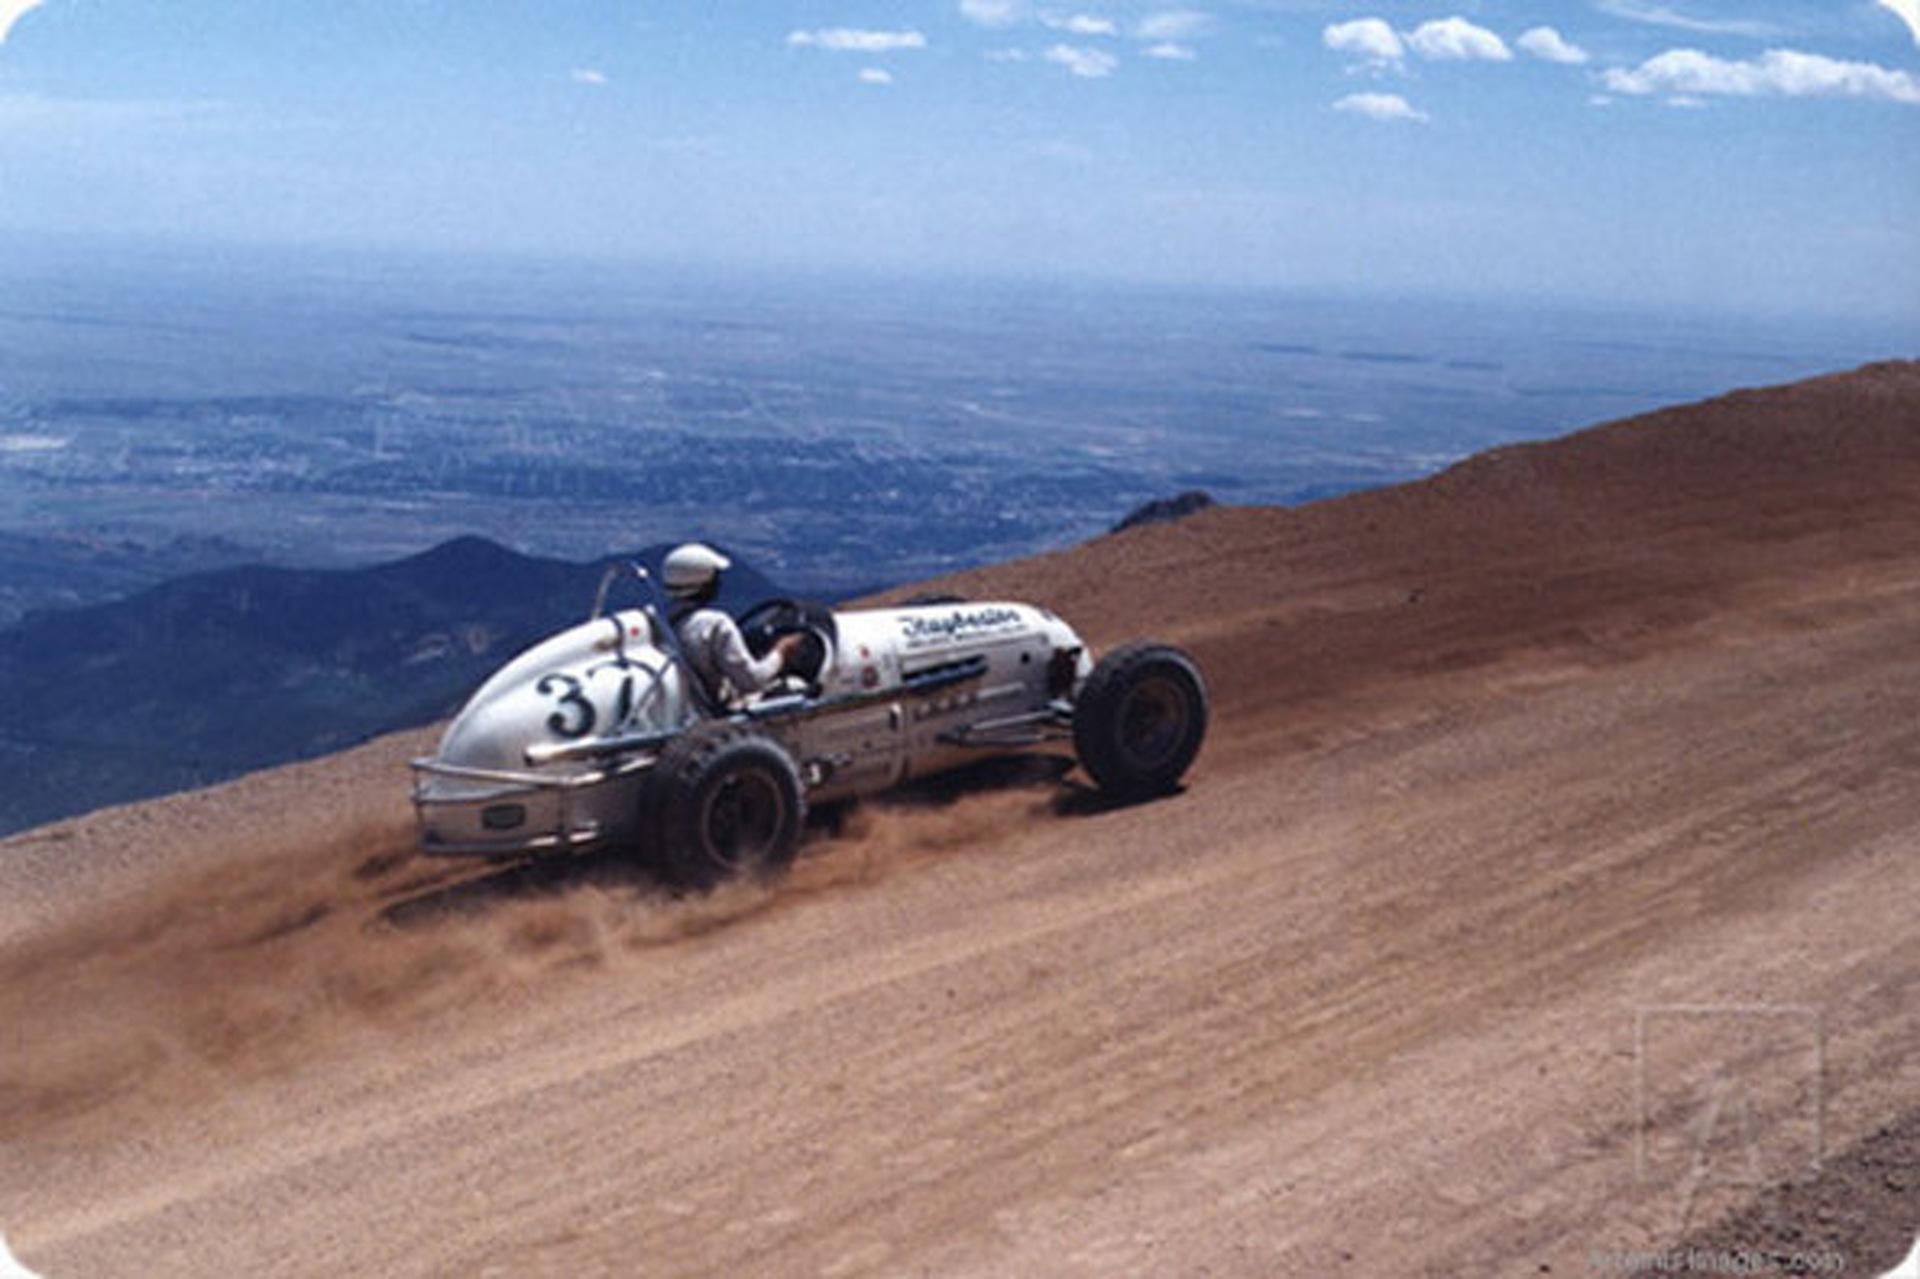 2012 Pikes Peak Hill Climb: Insanity at 14,000 Feet